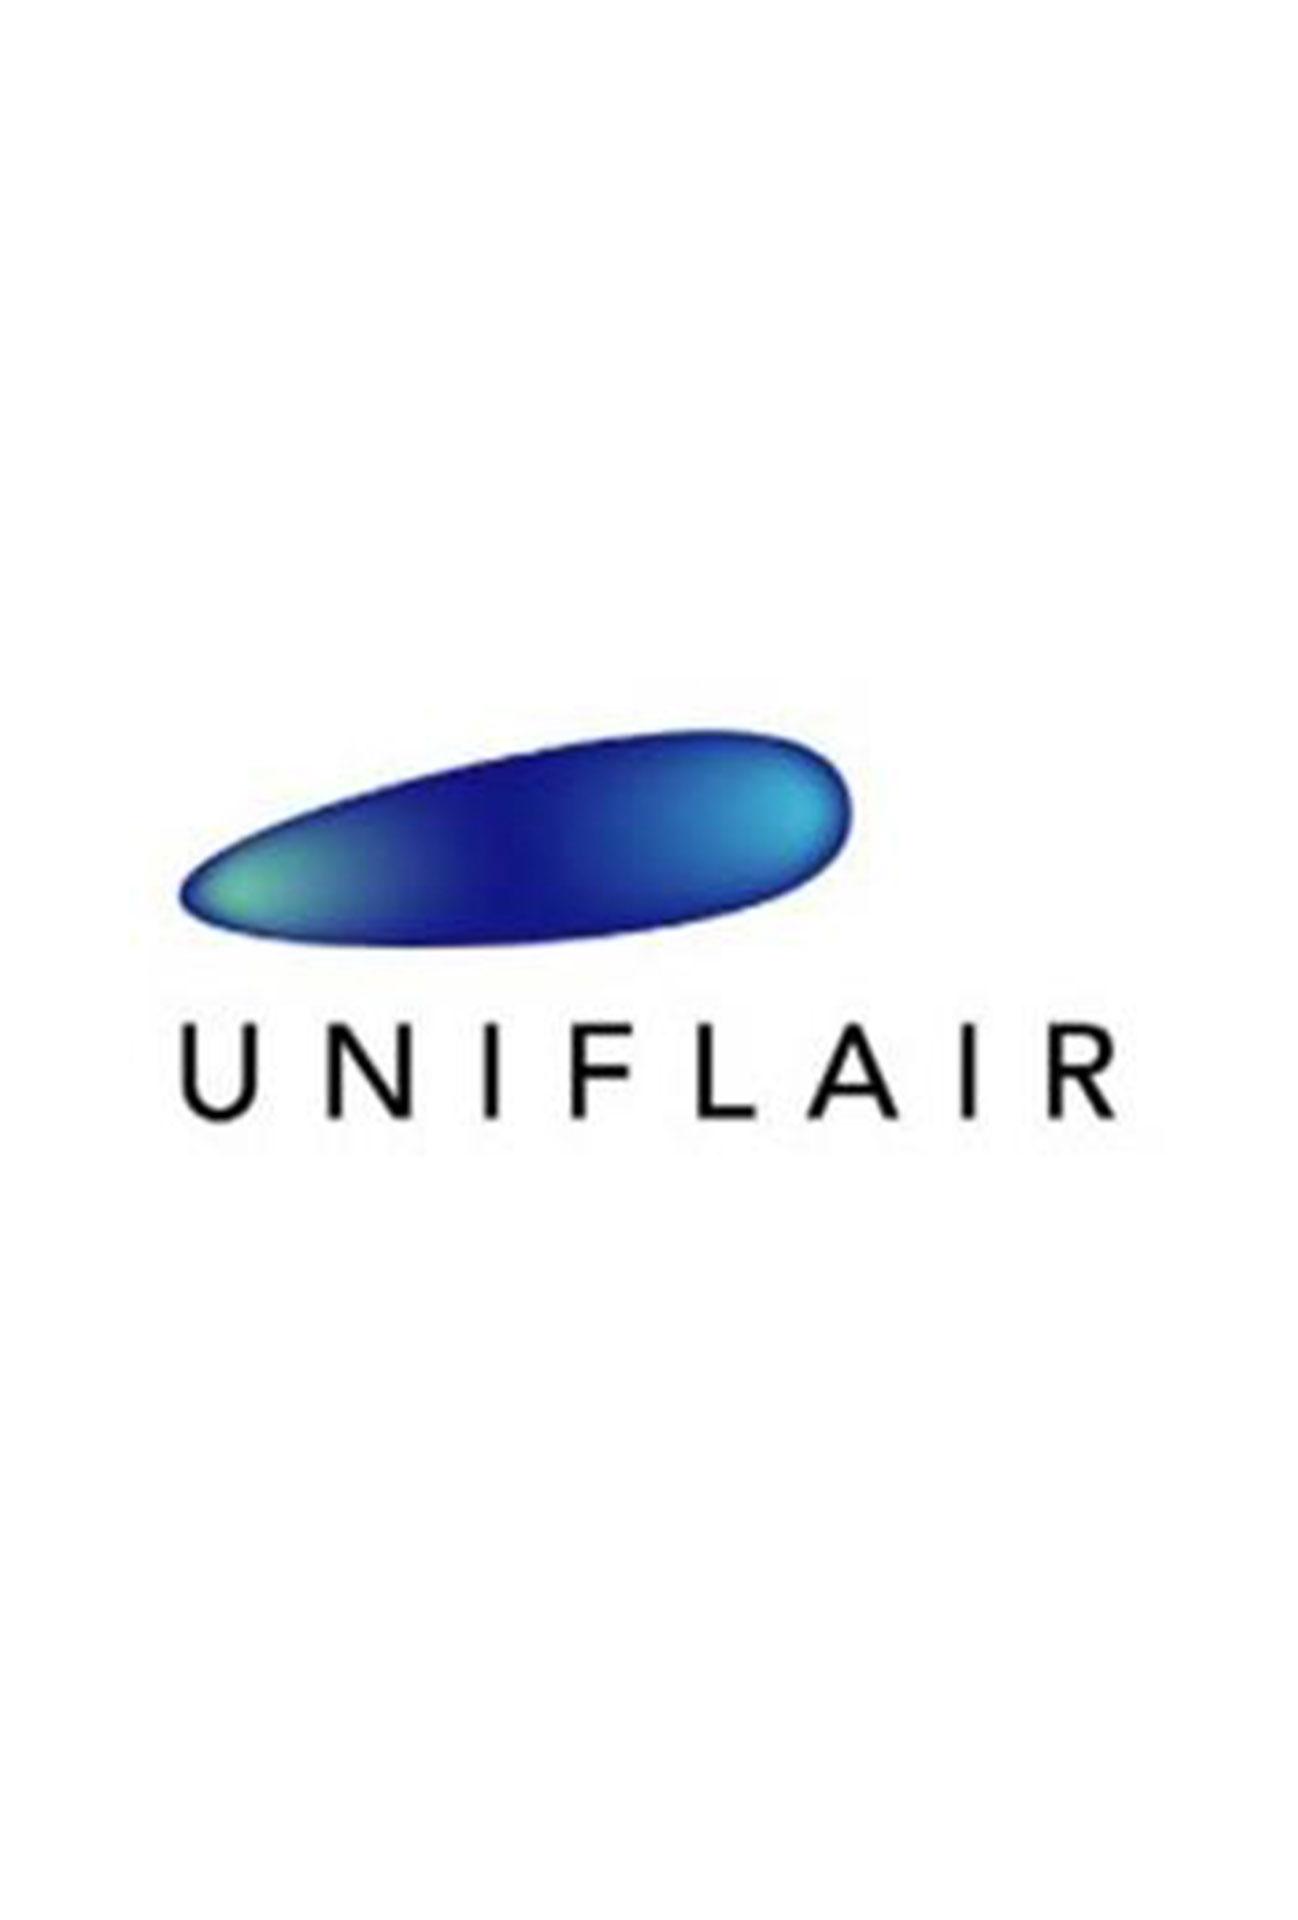 uniflair_p